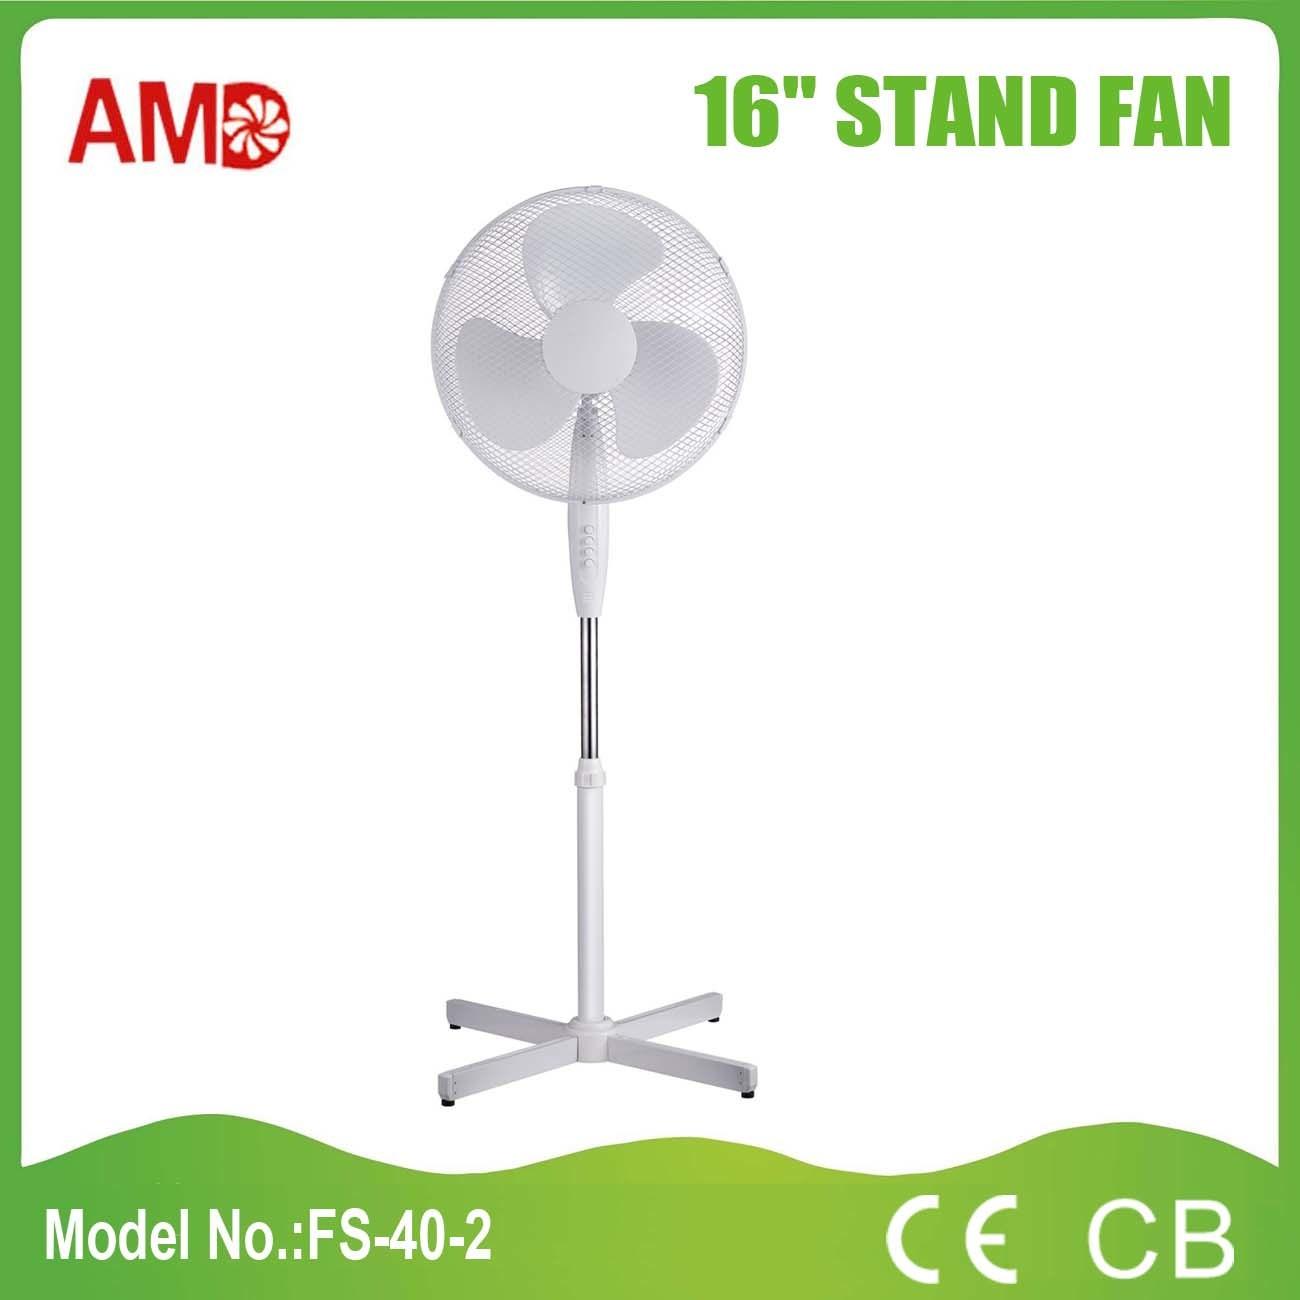 Hot-Sale European Market Stand Fan with CB Ce RoHS Certificate (FS-40-2)